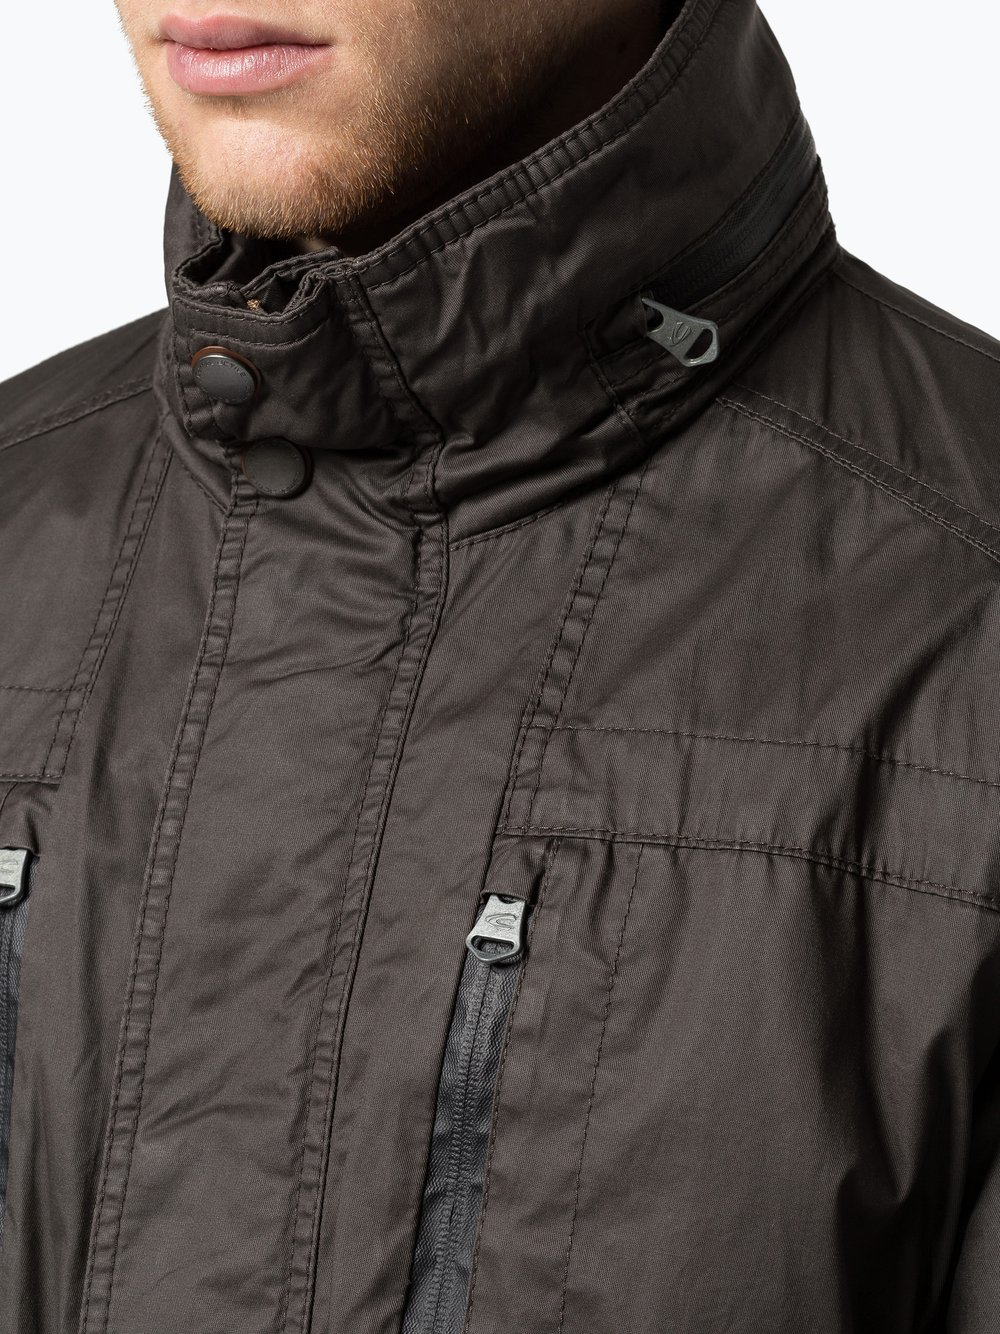 Jacket Jacke von camel active (Herren)